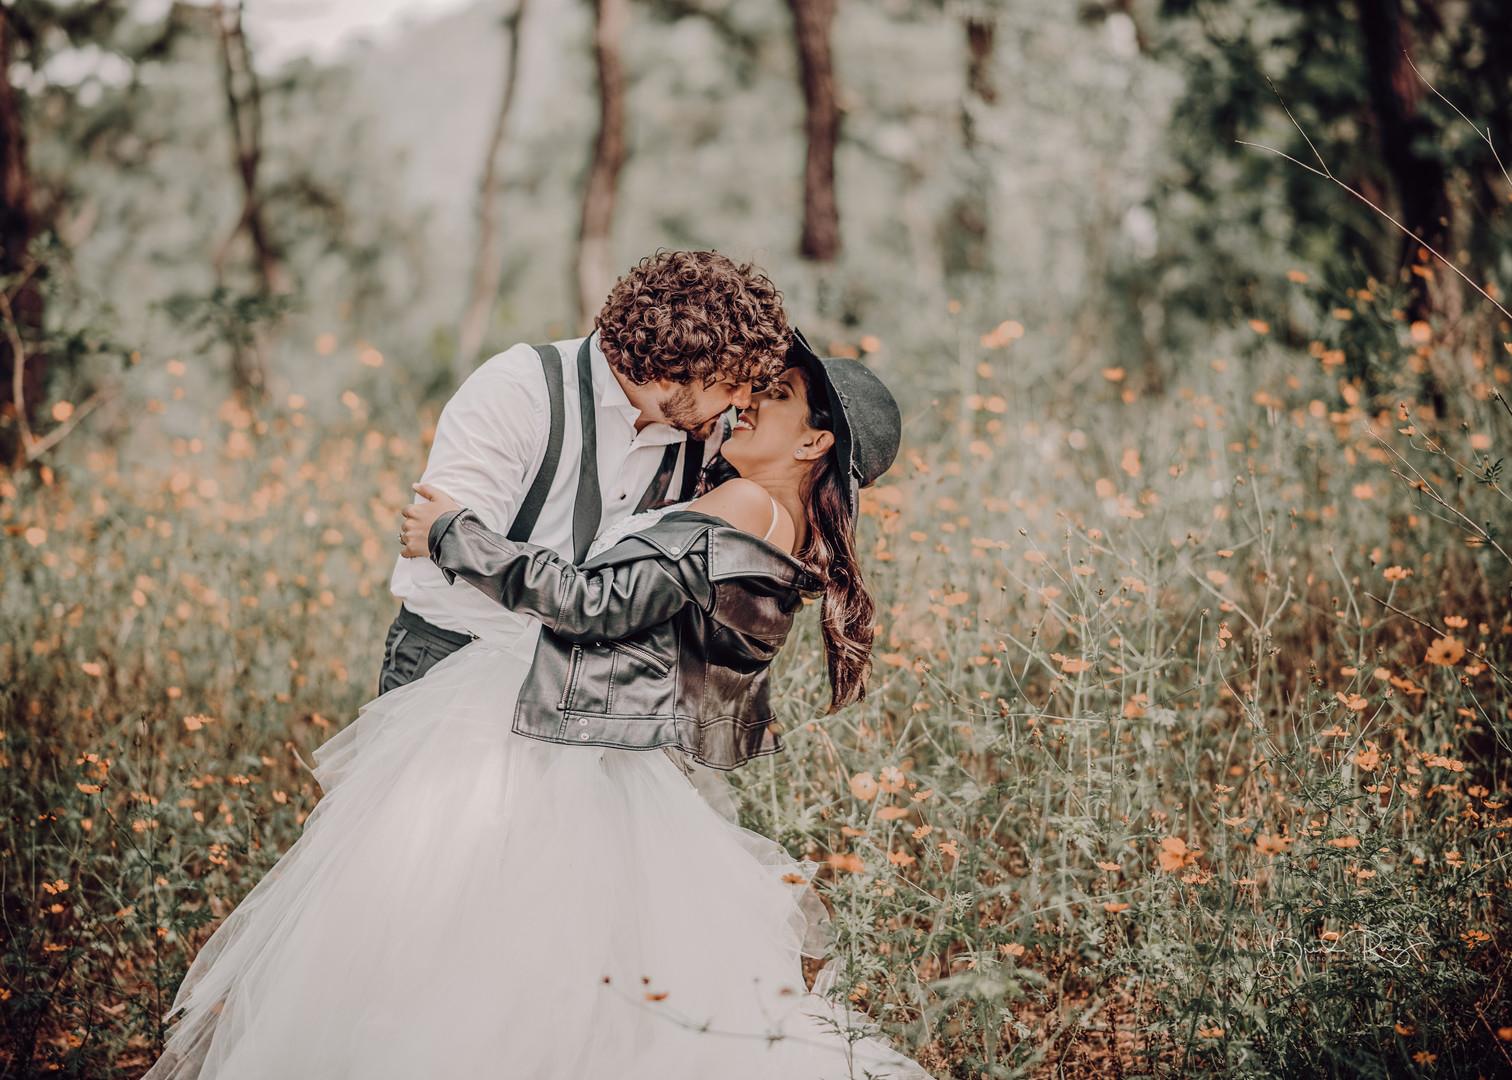 Fotografo de bodas en Guadalajara-14.jpg